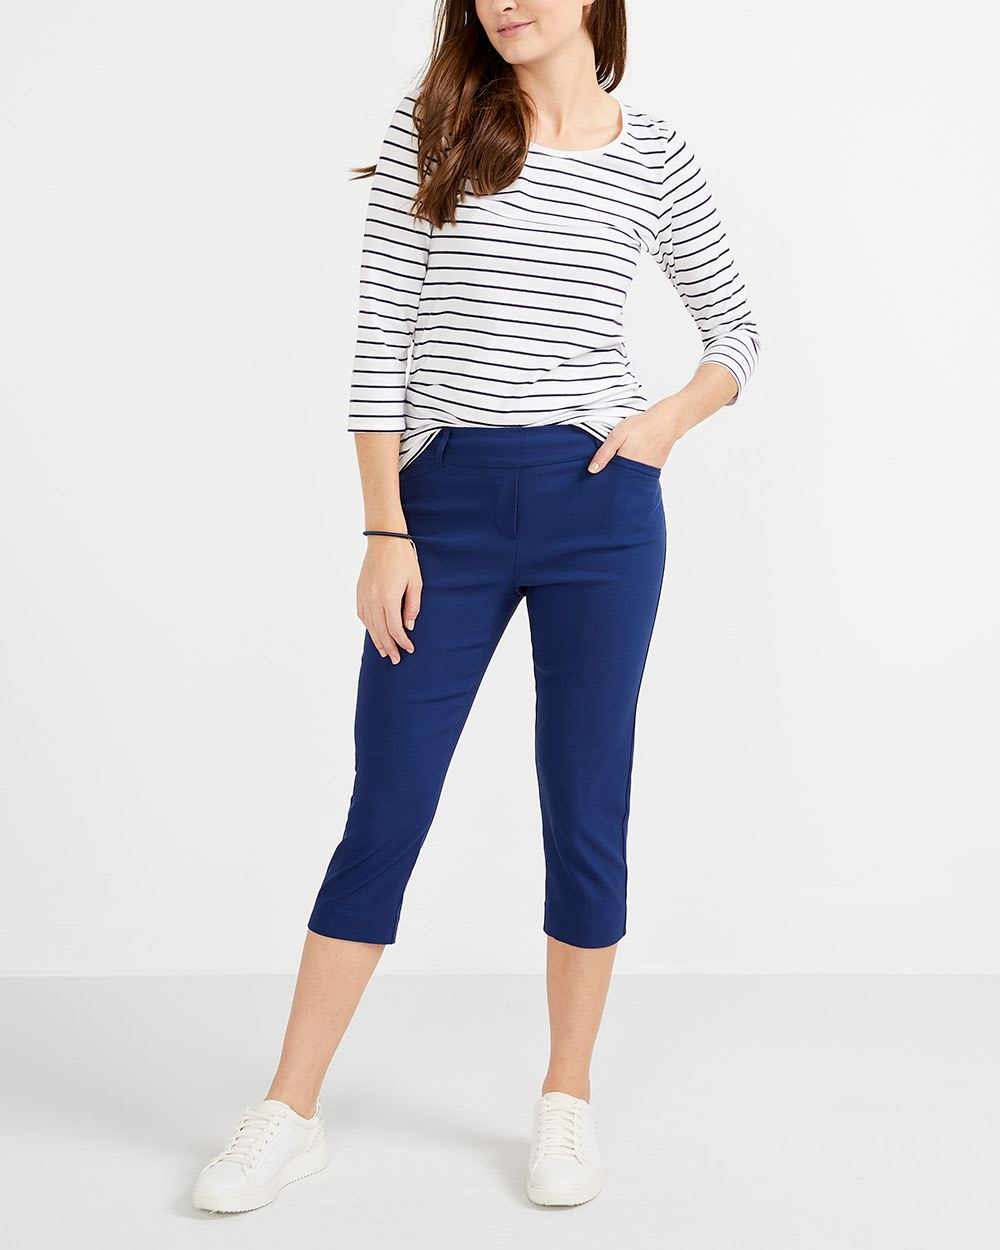 R Essentials ¾ Sleeve Striped Top